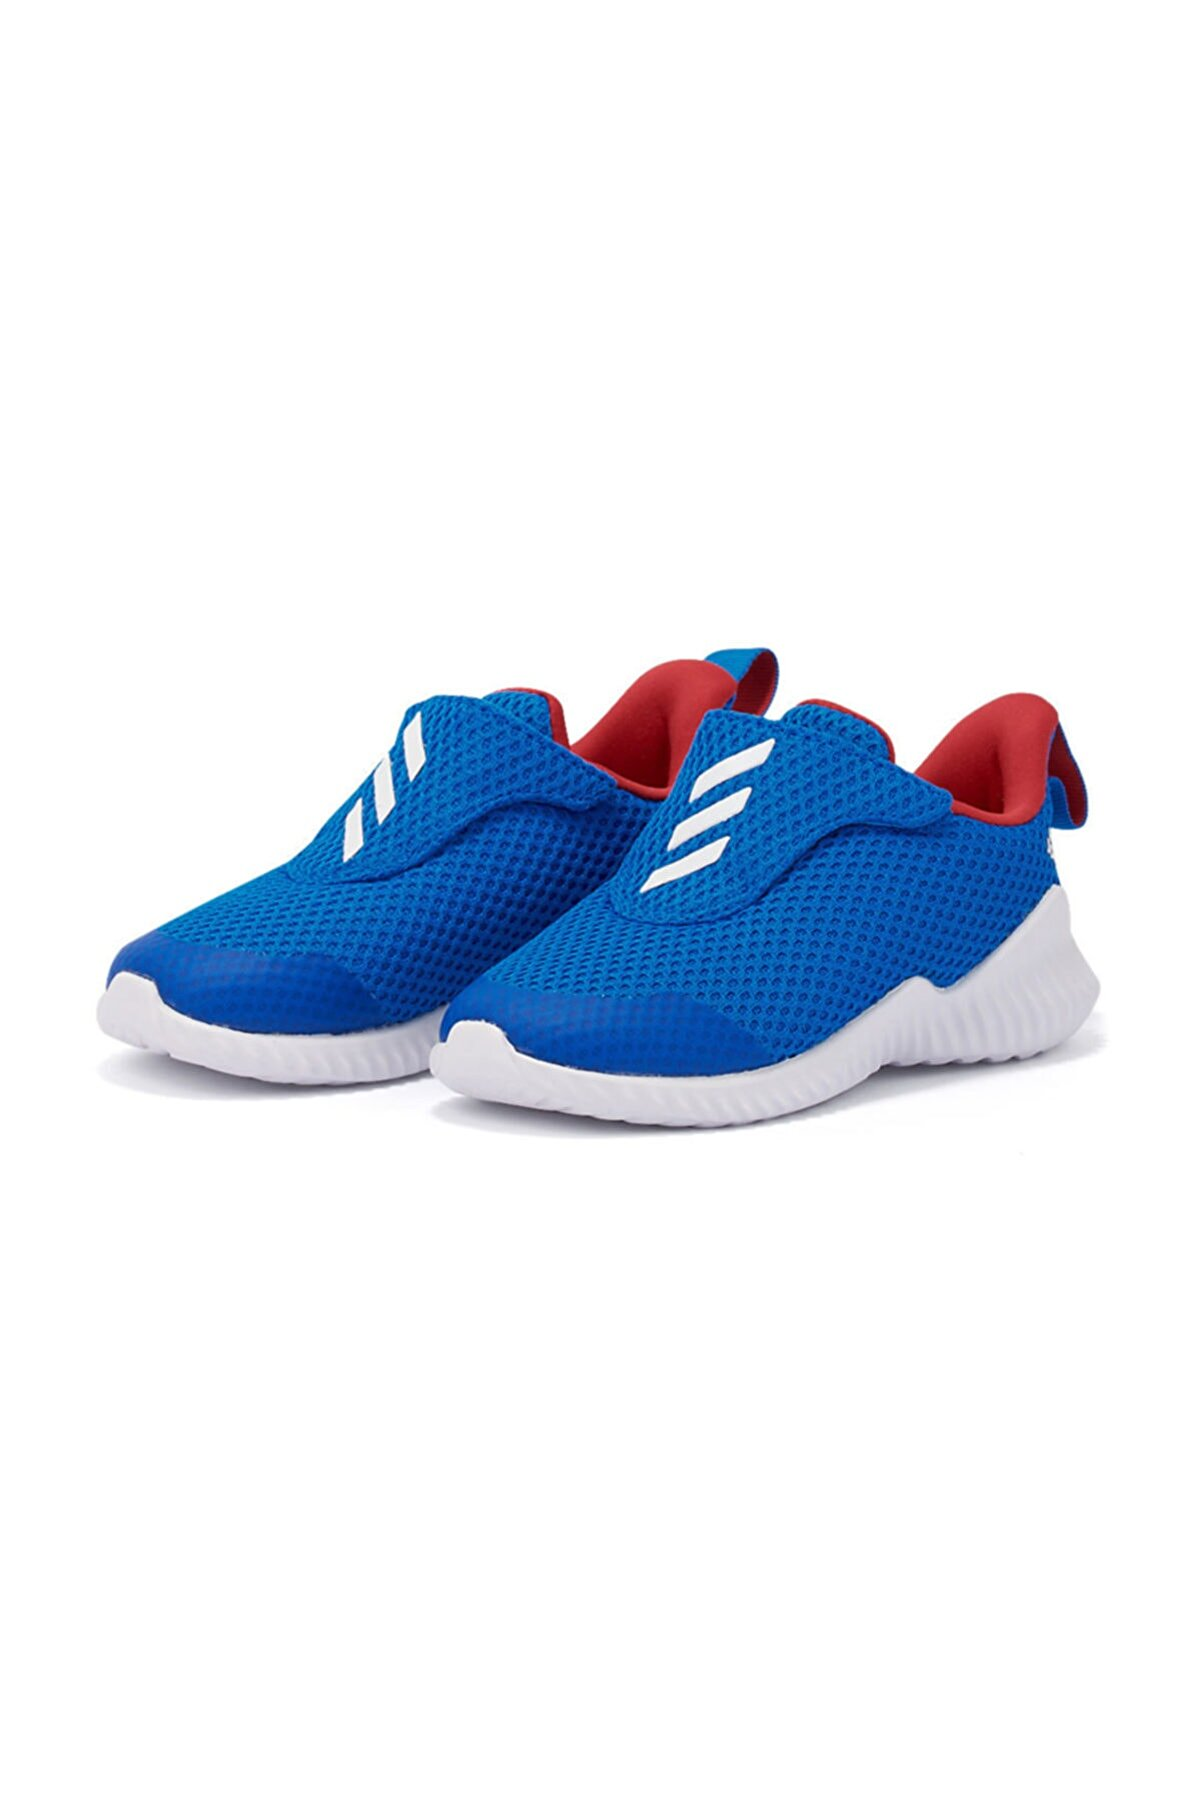 adidas Fortarun Ac Ayakkabı - Mavi |  Turkey